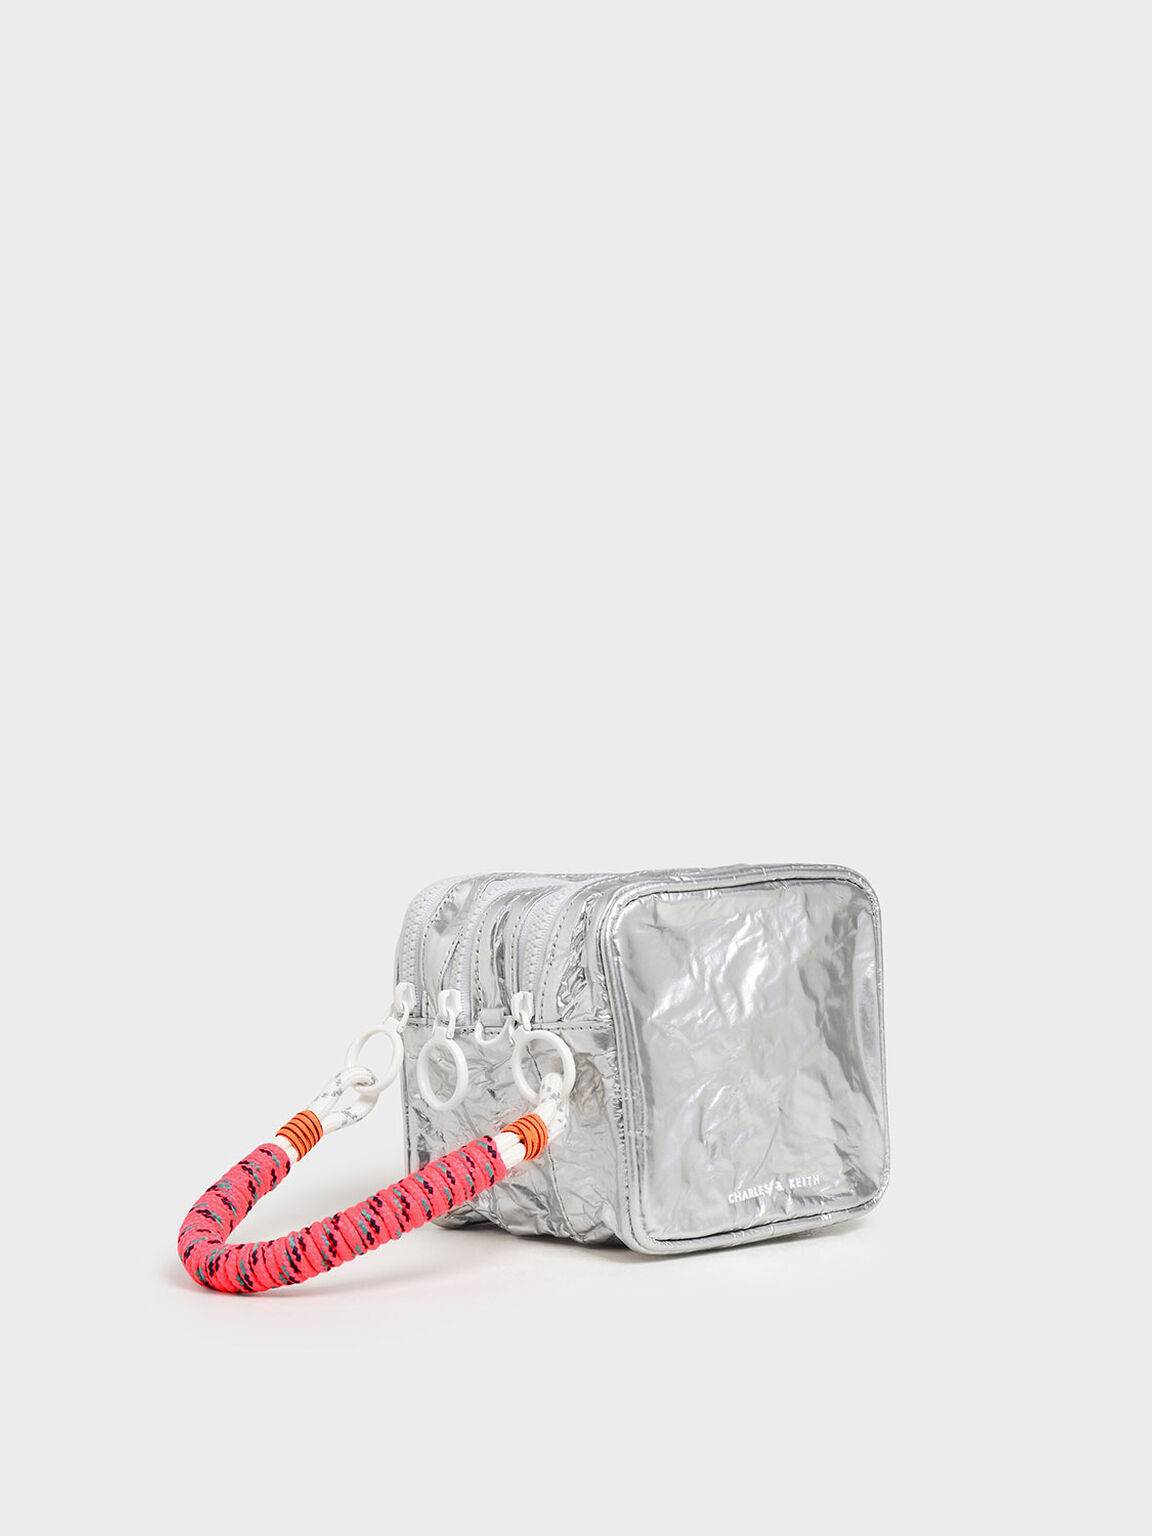 Crumpled Effect Zipper Pouch, Silver, hi-res